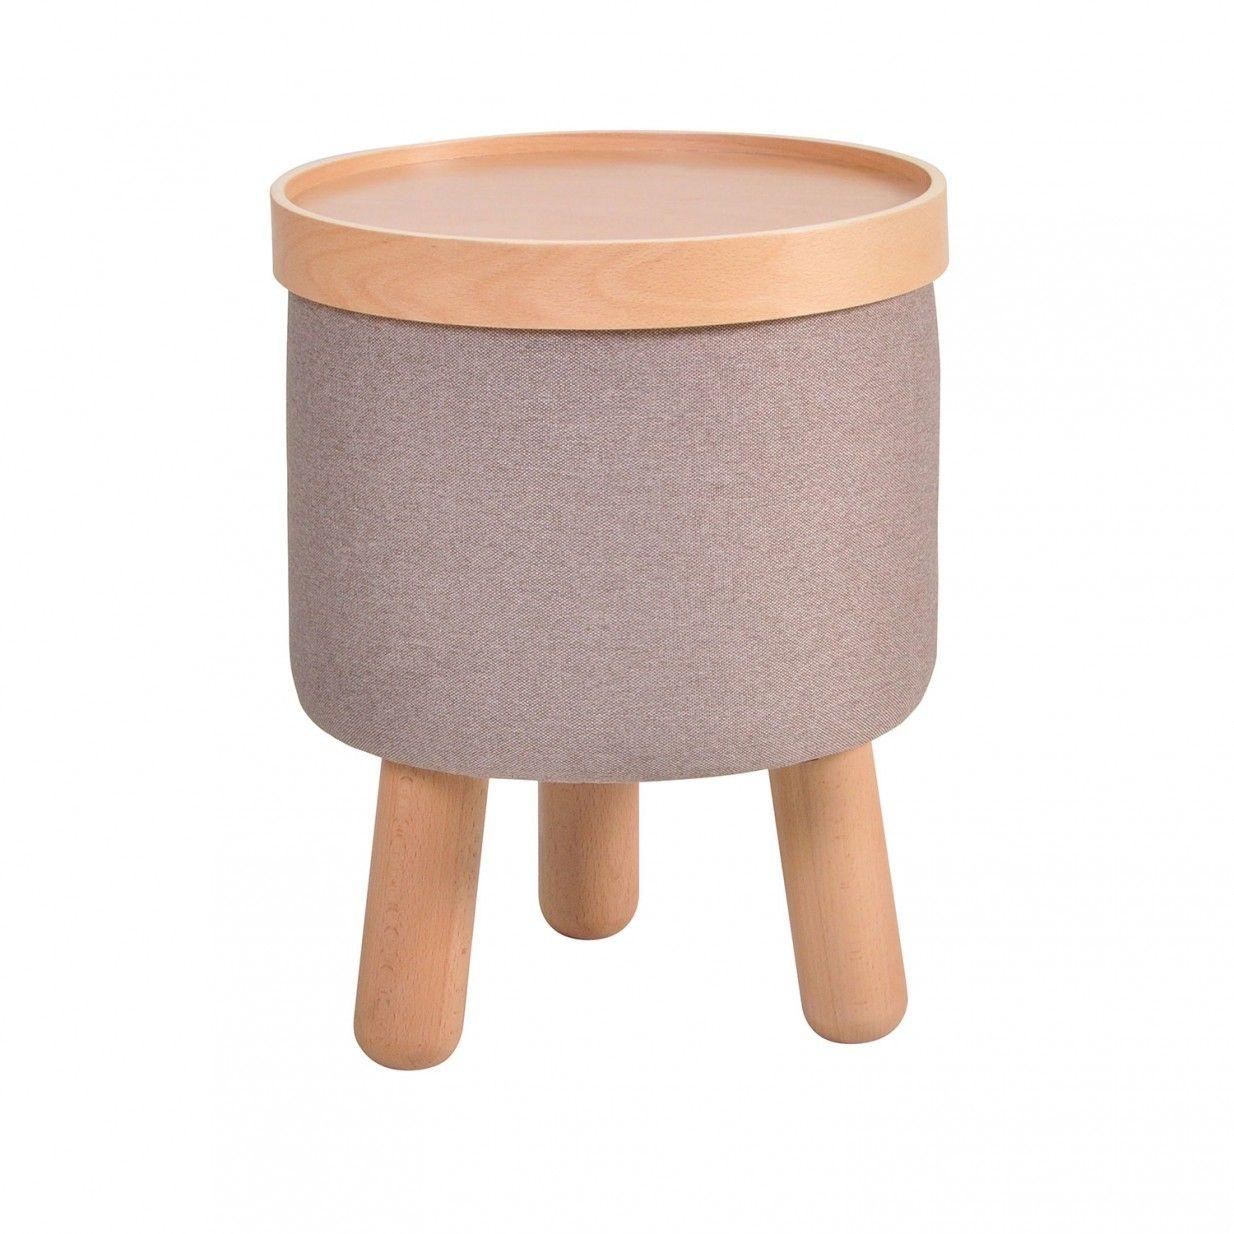 hoher tisch hocker braun garageeight haben will pinterest stool table and cyprus. Black Bedroom Furniture Sets. Home Design Ideas